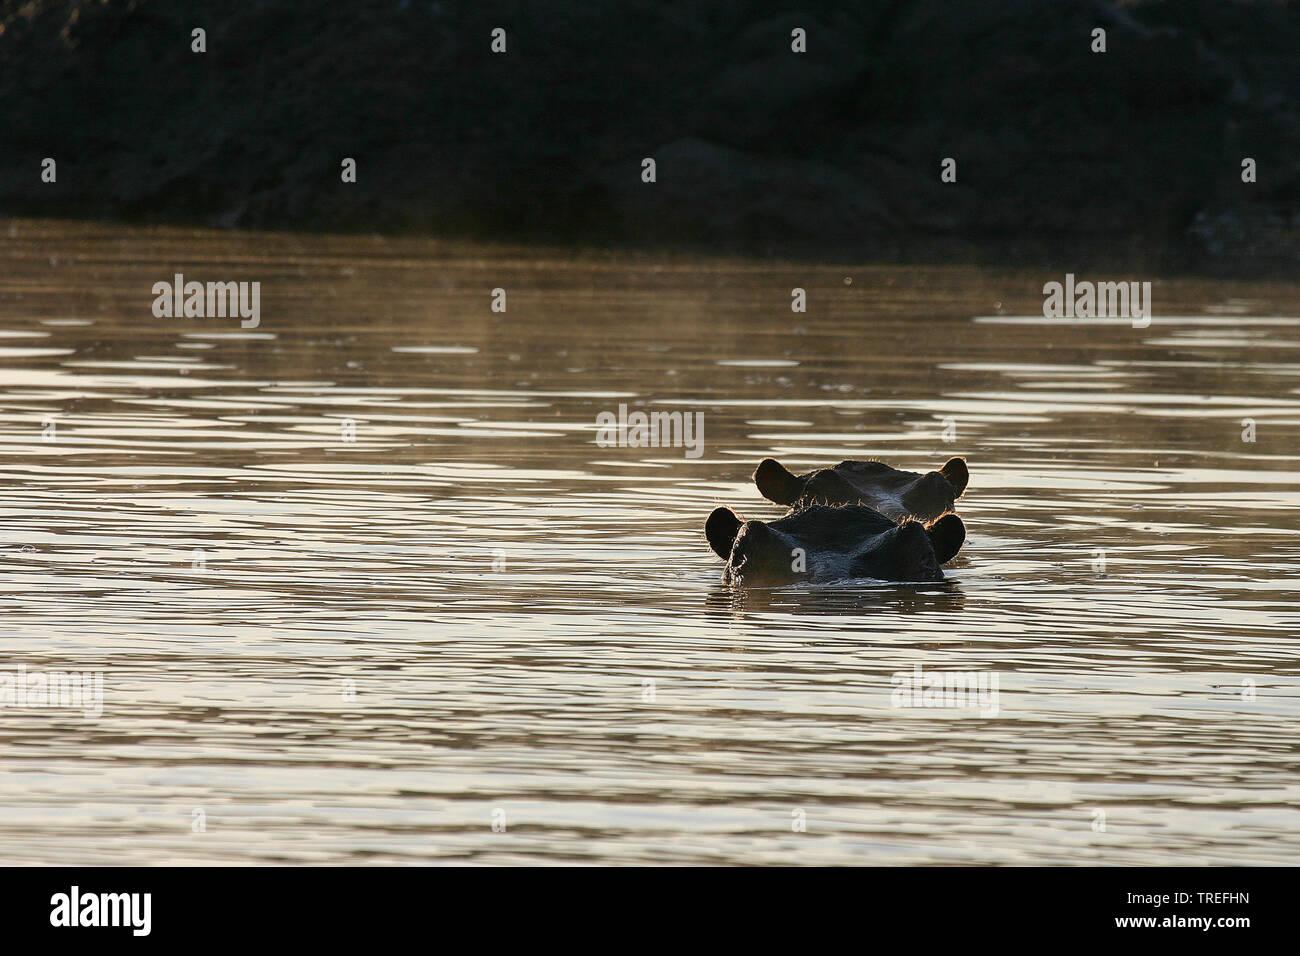 Nilpferd, Flusspferd, Grossflusspferd (Hippopotamus amphibius), zwei Nilpferde schauen aus dem Wasser heraus, Suedafrika | hippopotamus, hippo, Common - Stock Image